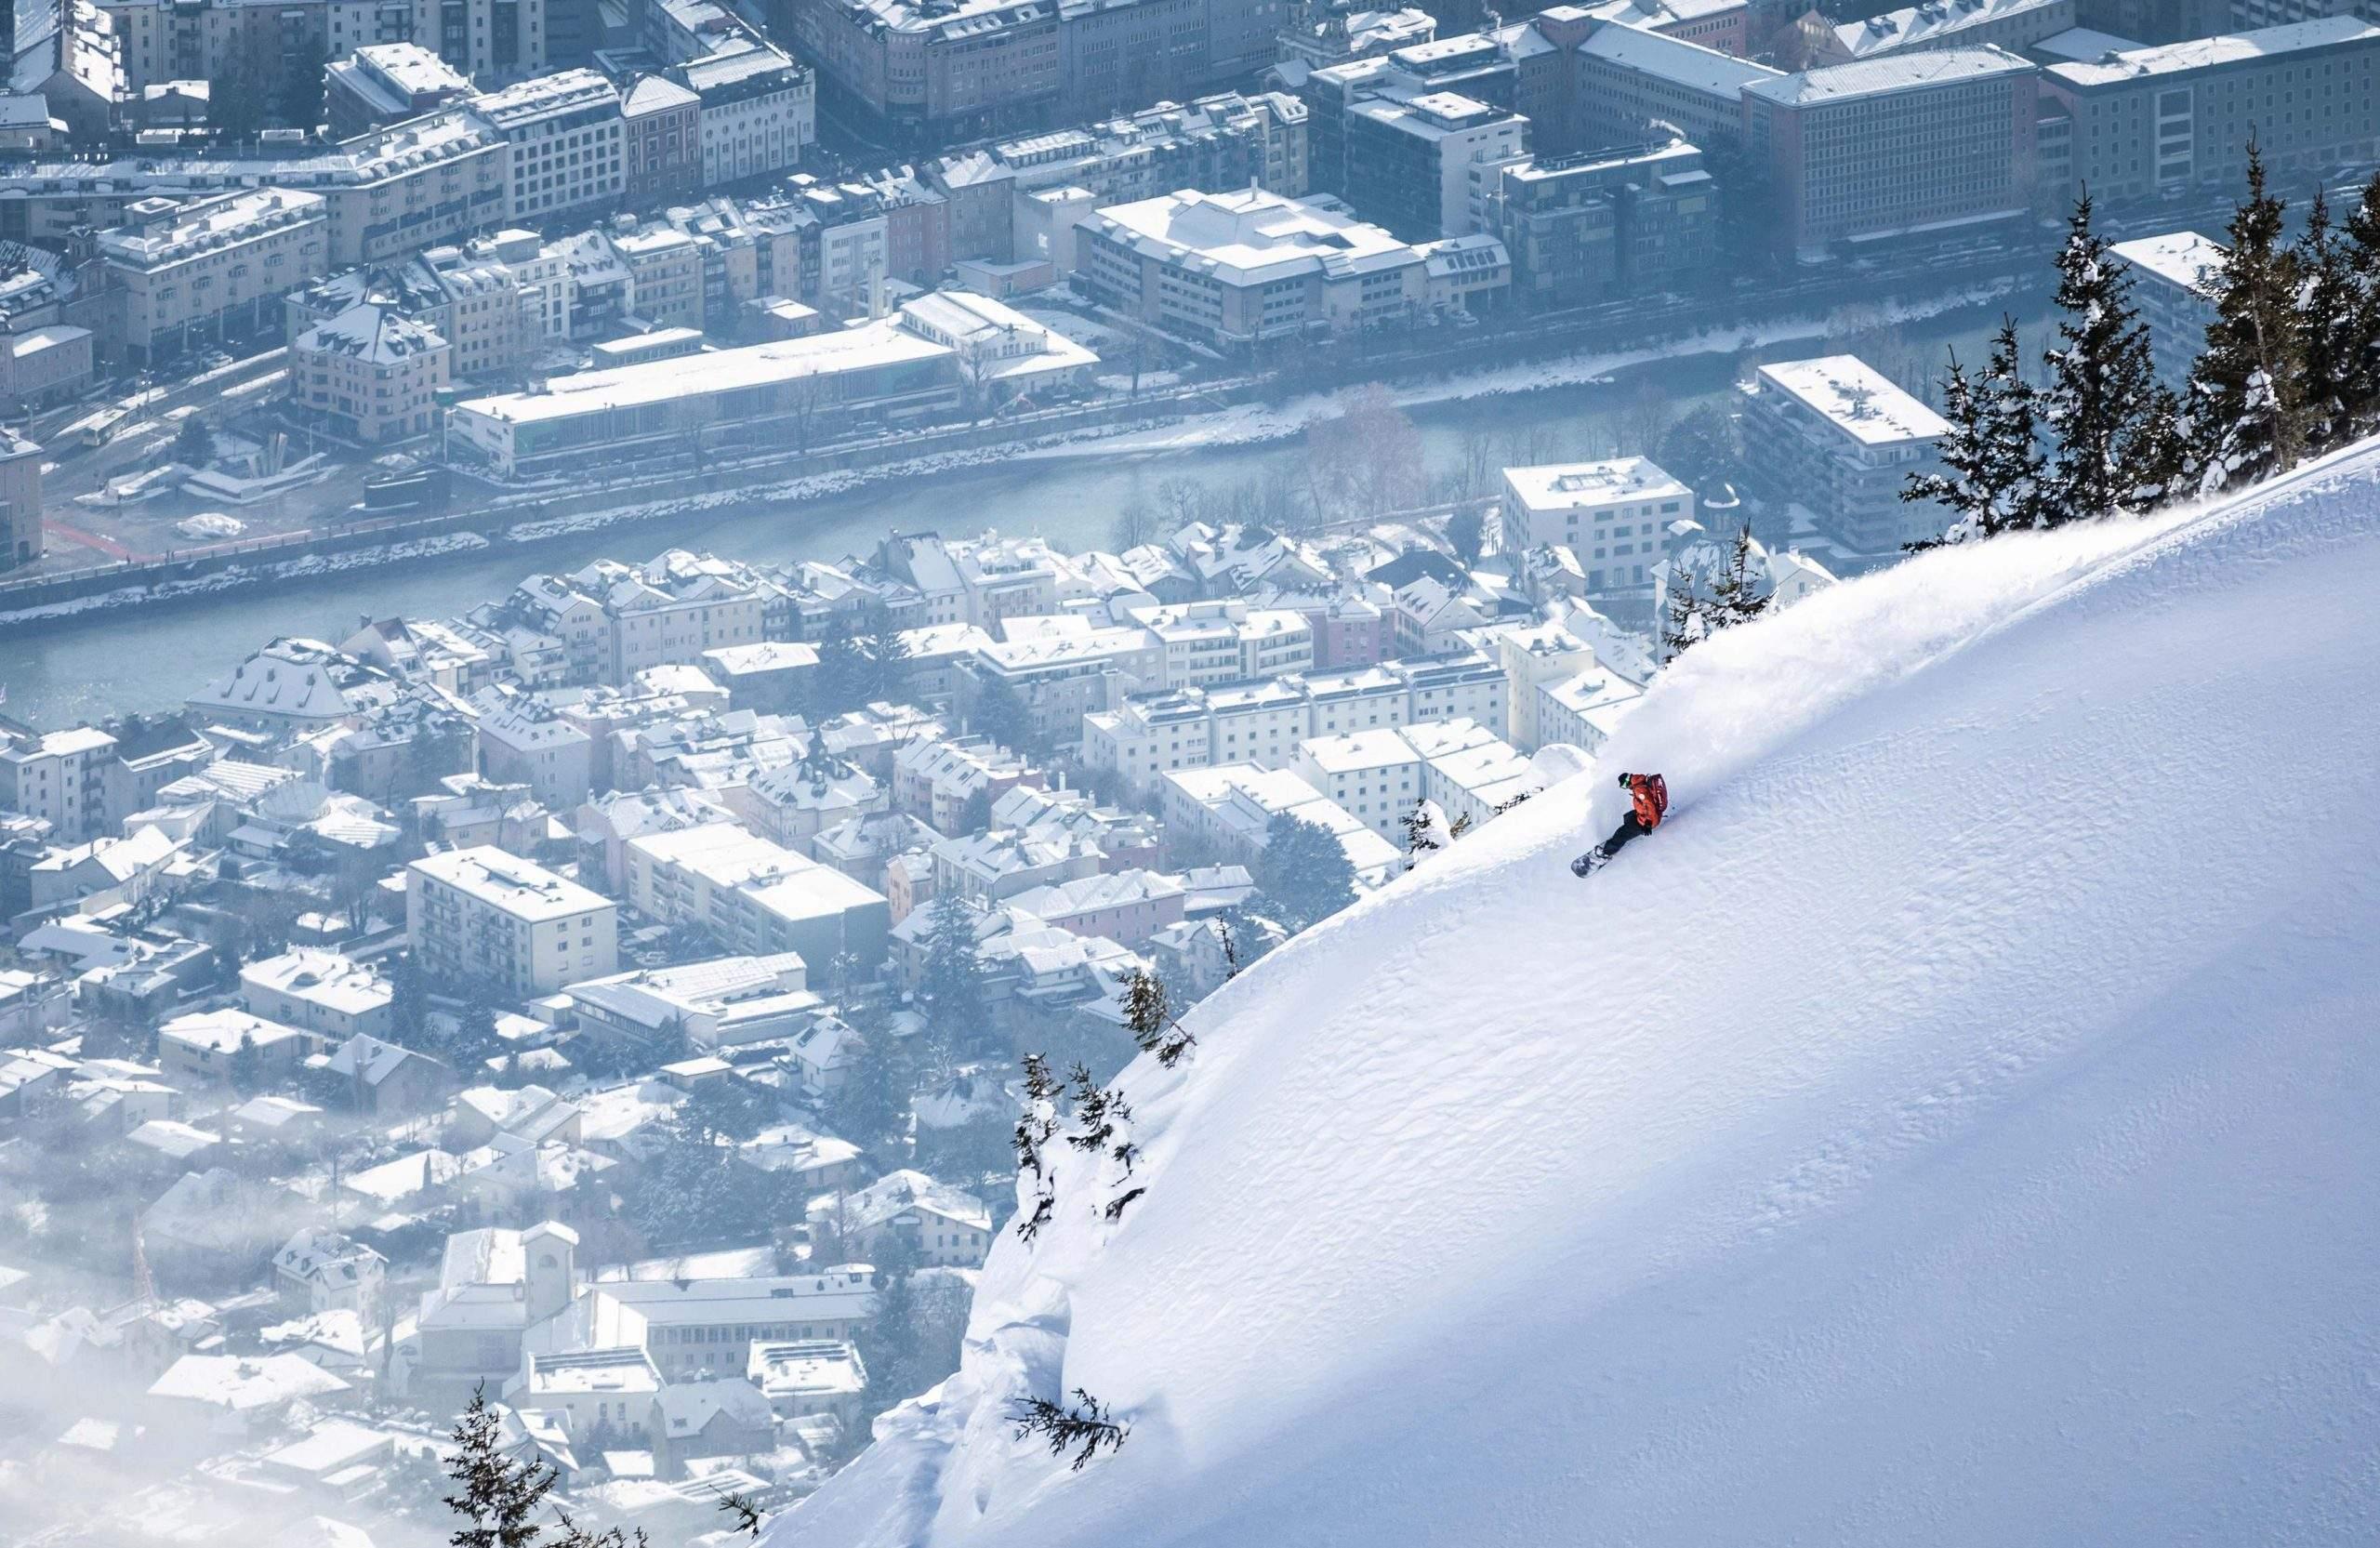 Riedz_Absteige_Apartments_Innsbruck_Tirol_Austria_Alps_Holiday_Sports_Accommodation-7_20zu13WEB